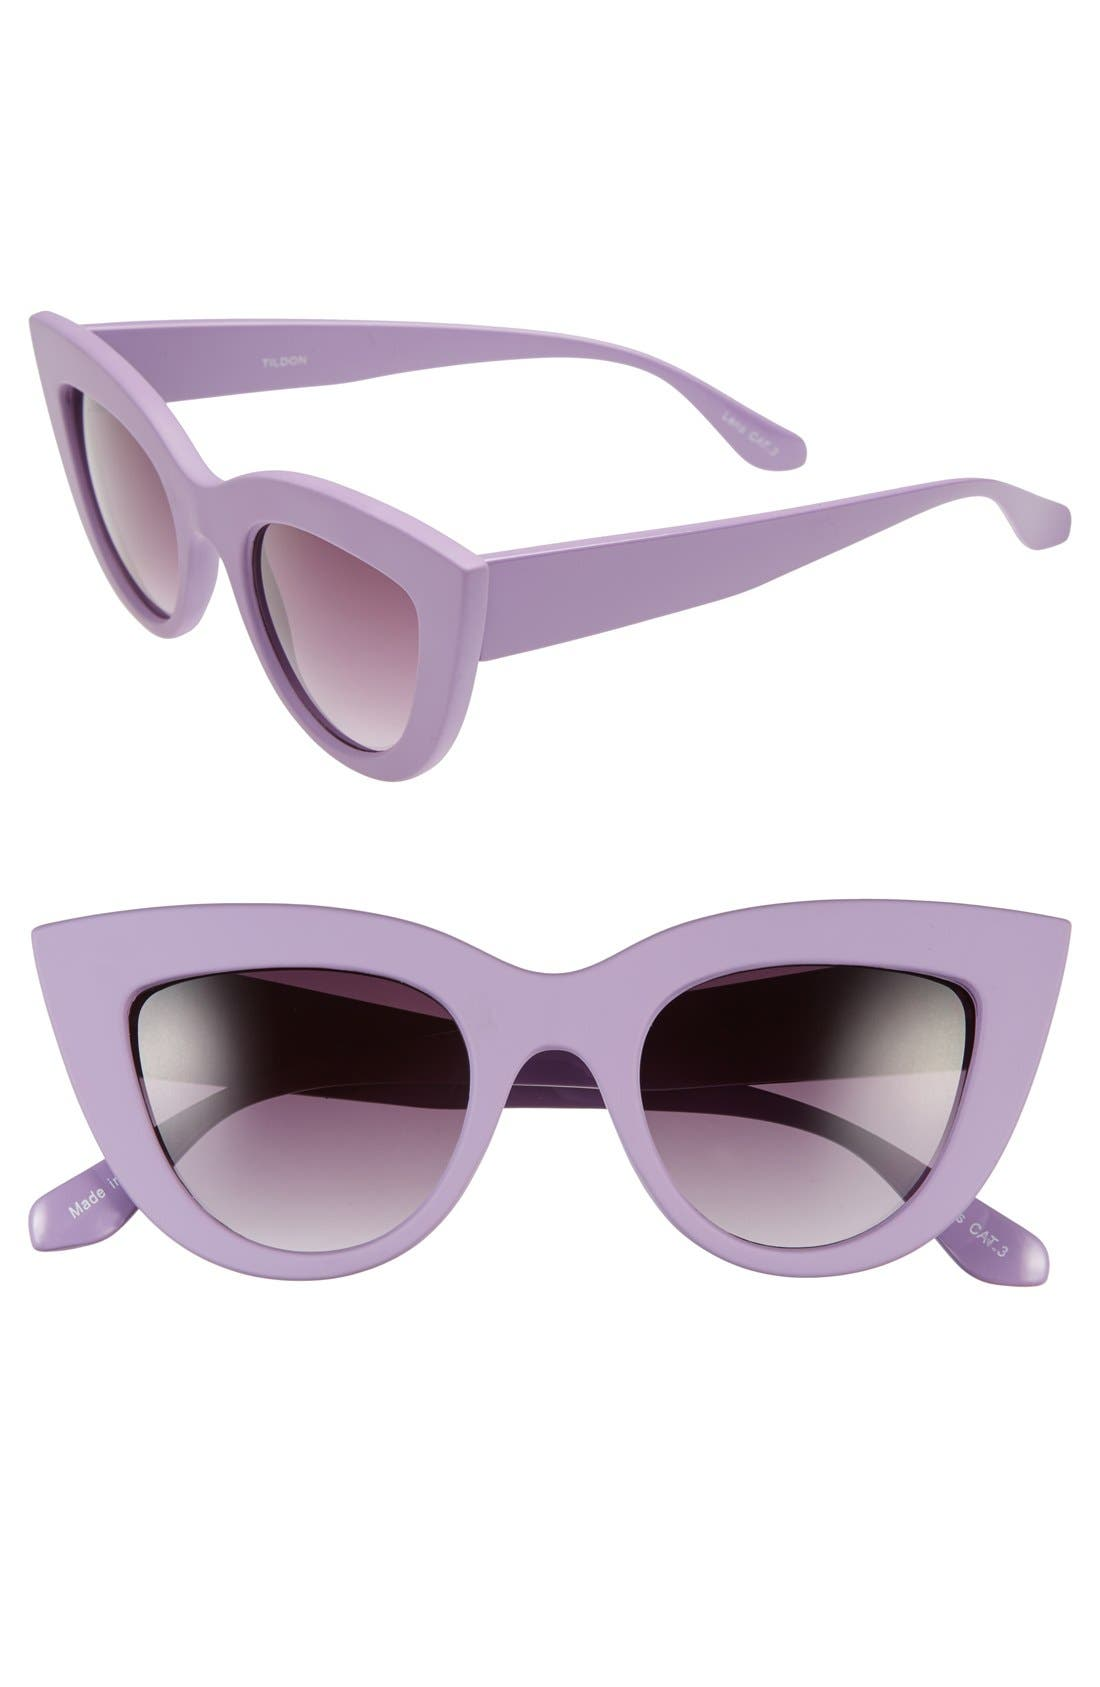 42mm Cat Eye Sunglasses,                             Main thumbnail 1, color,                             Purple